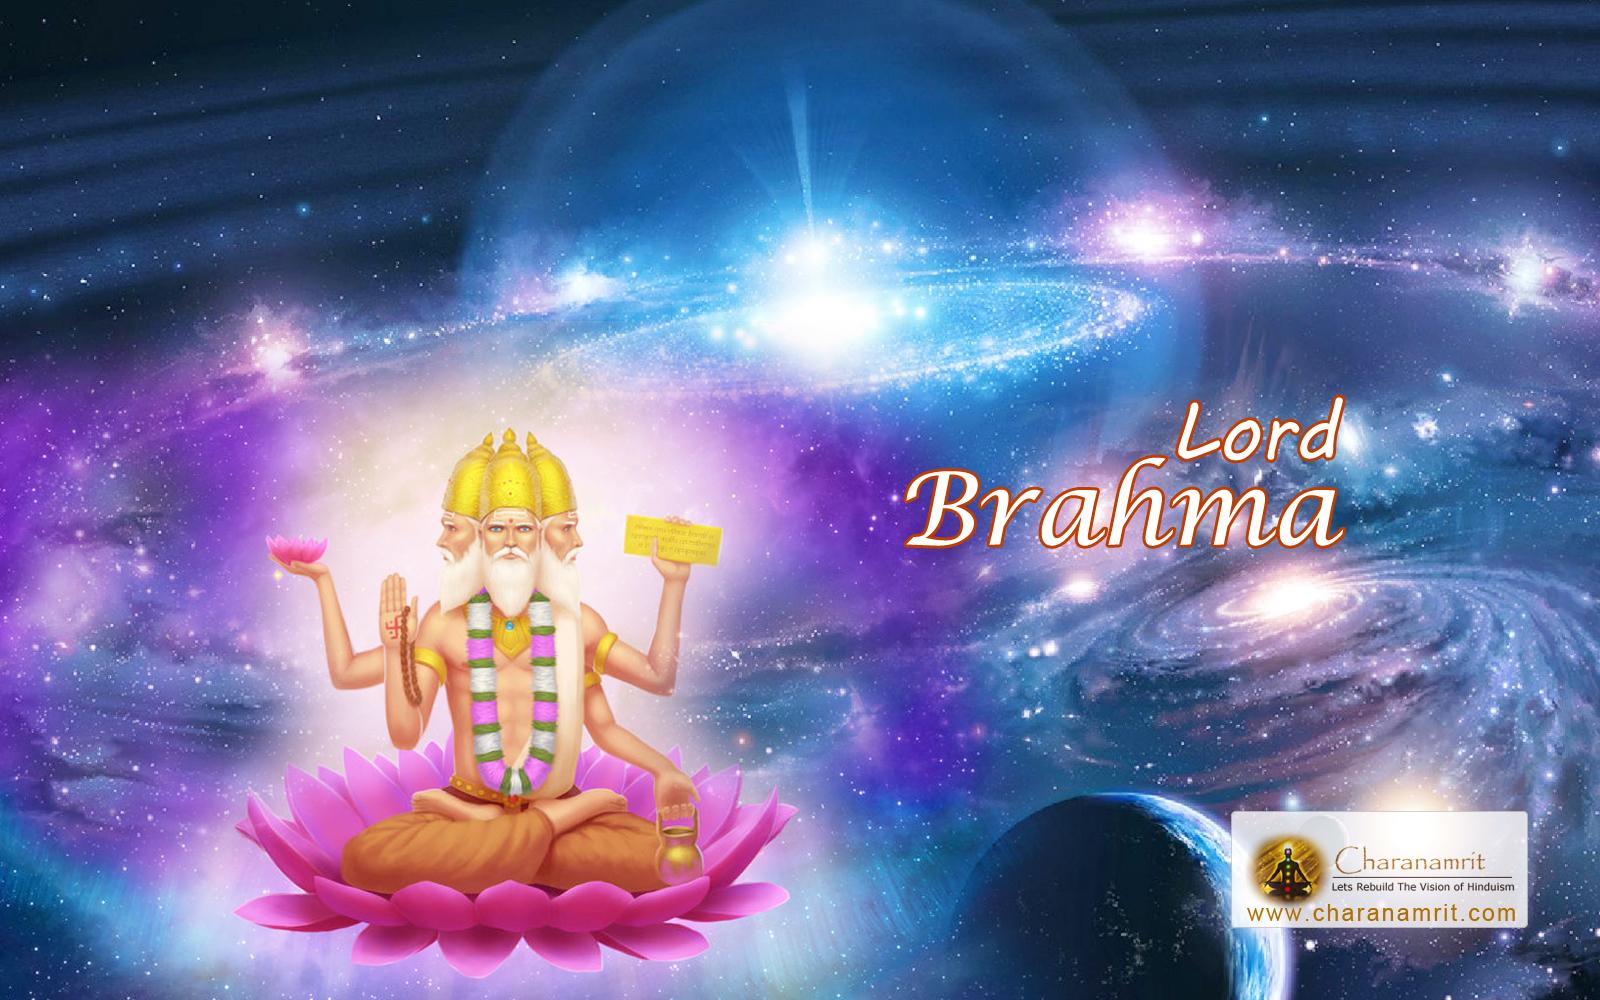 God Shi Brahma dev beautiful 3D HD Wallpaper for download width 1600x1000